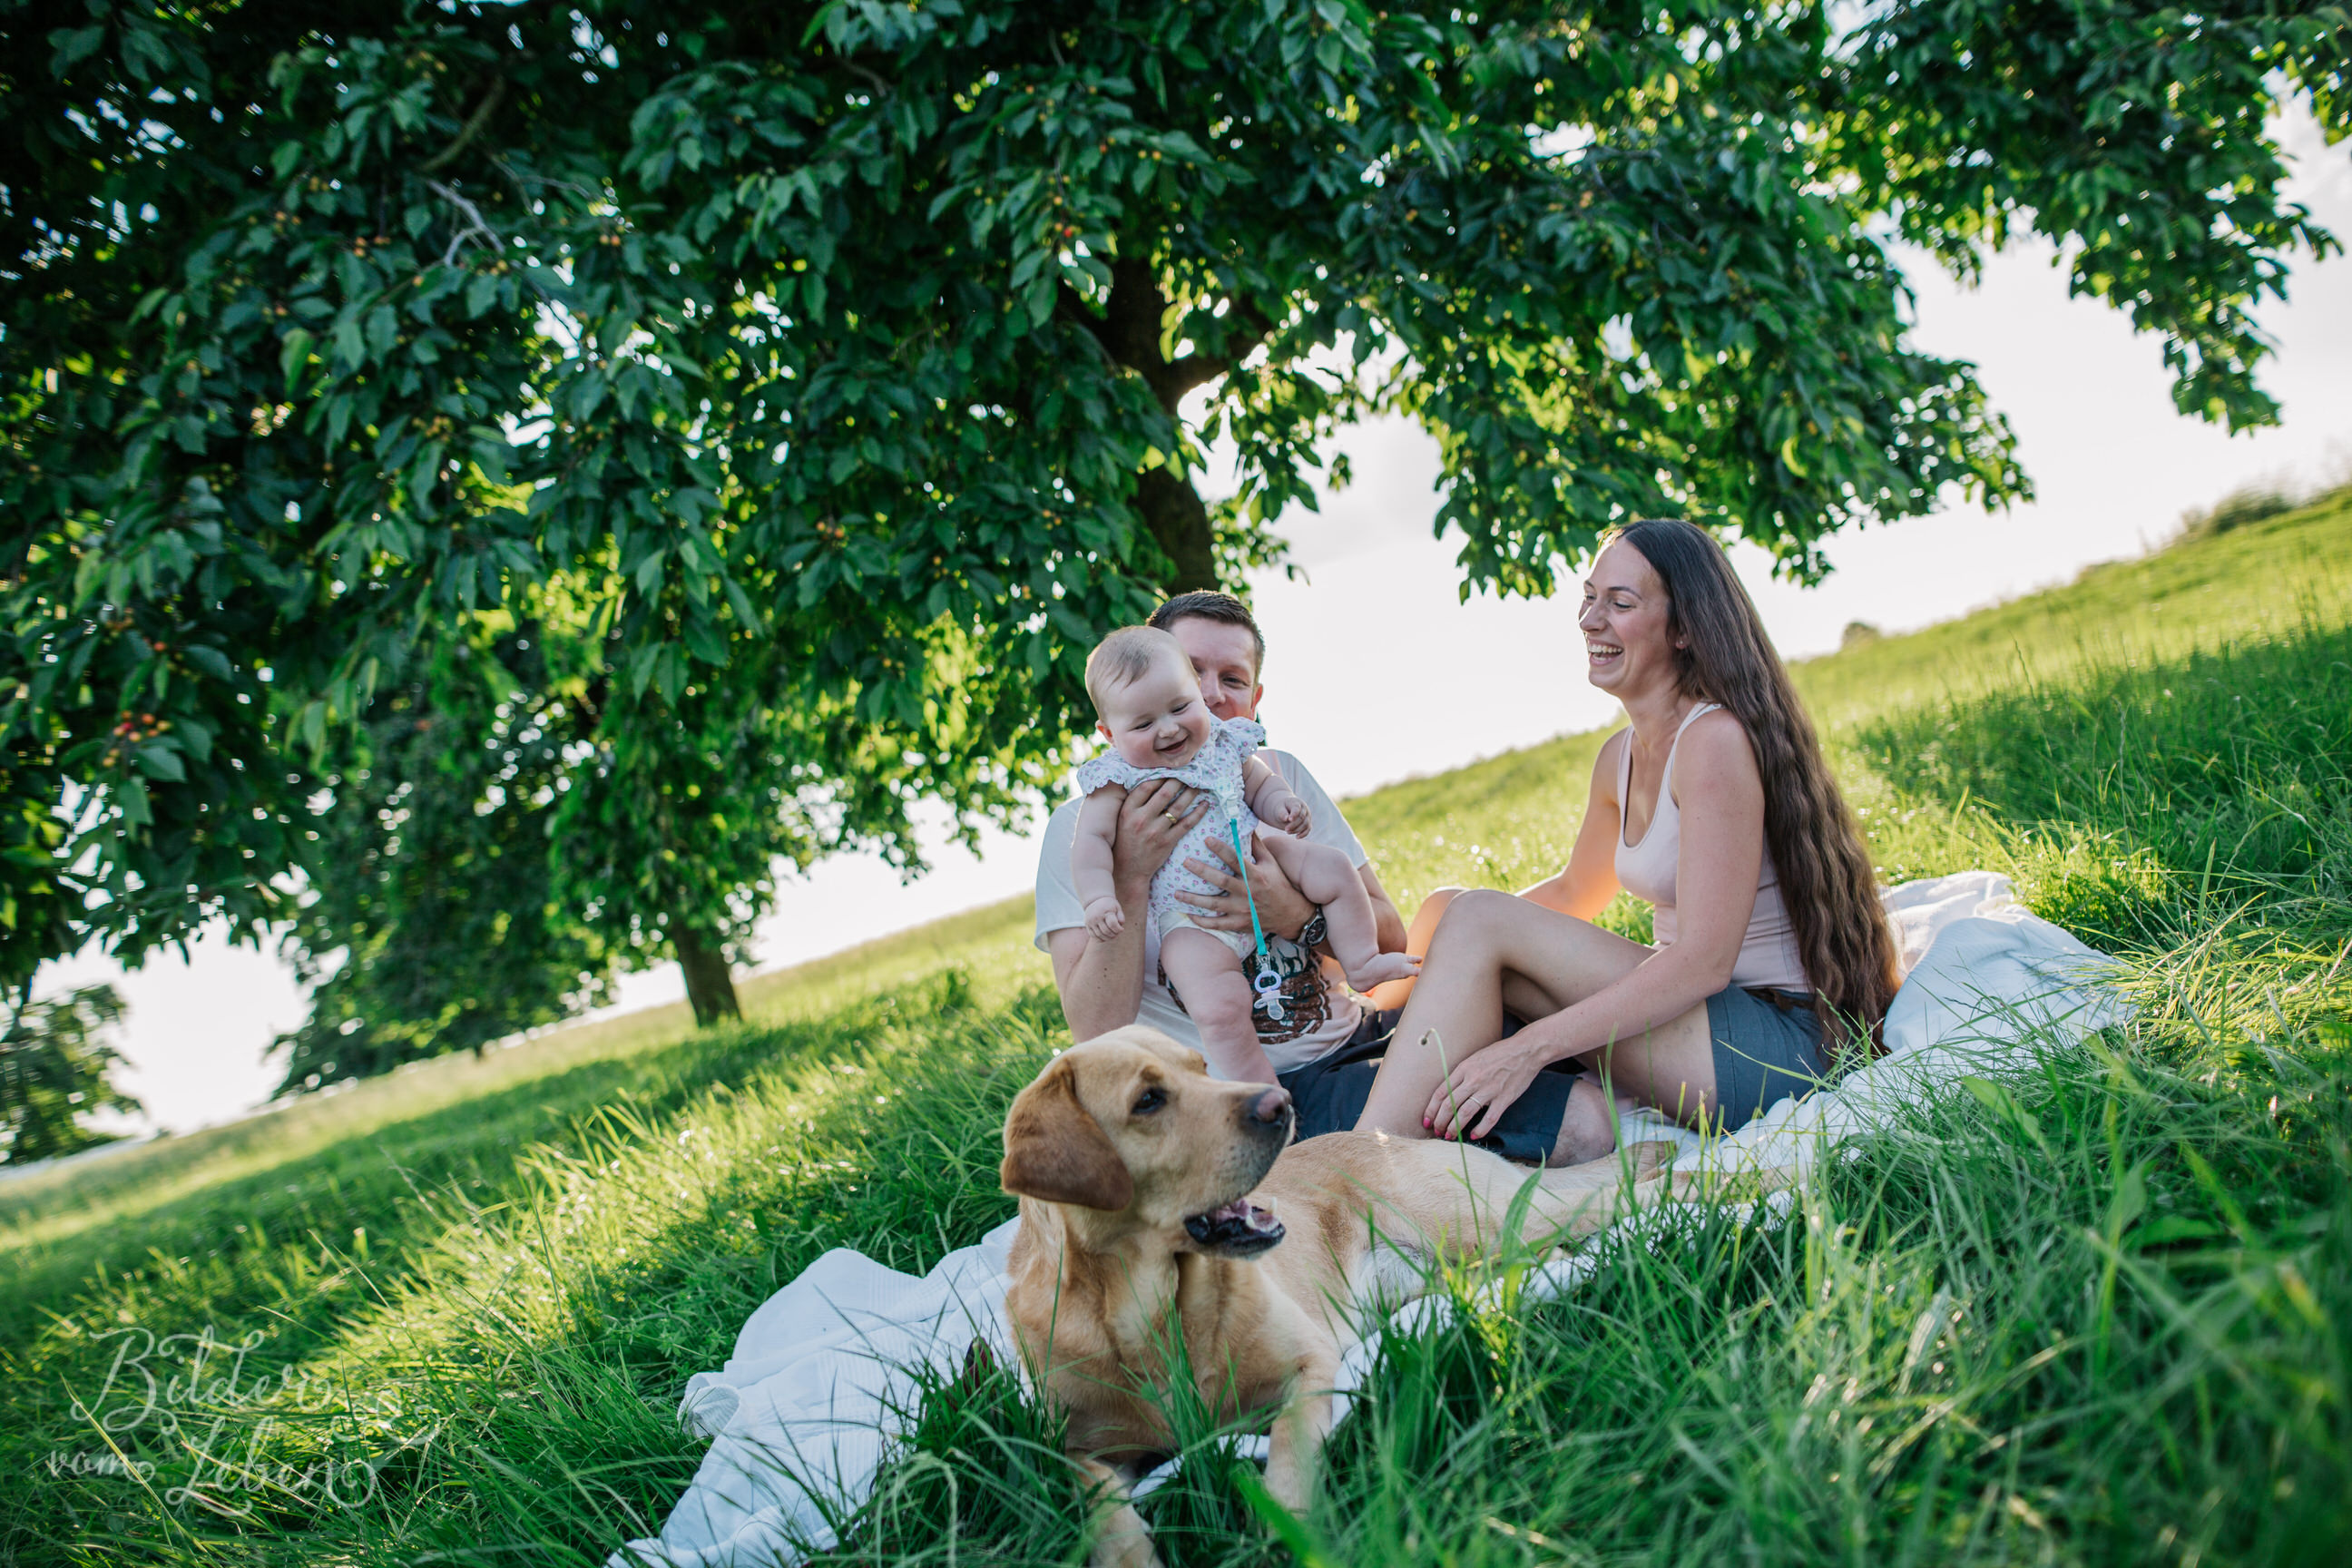 Greta-Labrador-Kinder-Portraits-BildervomLeben-2016-8147